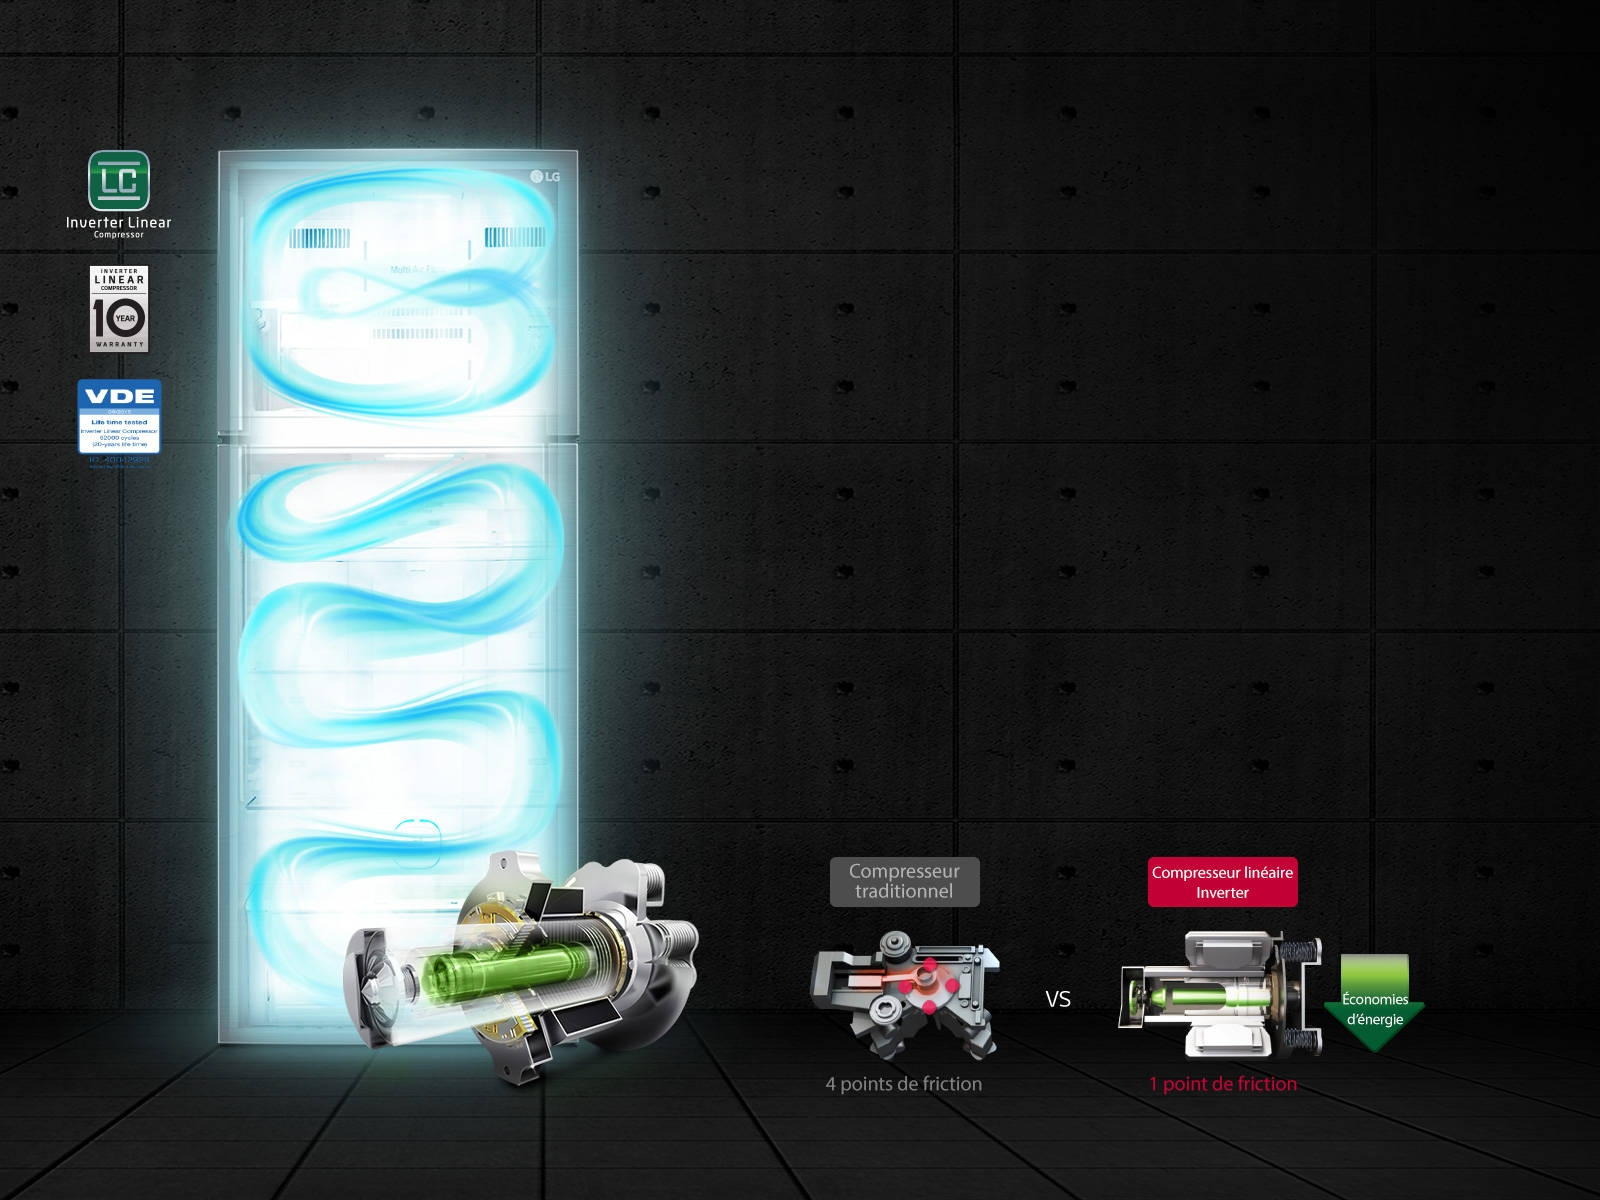 GL-C402RQCN_Inverter-Linear-Compressor_201017_D